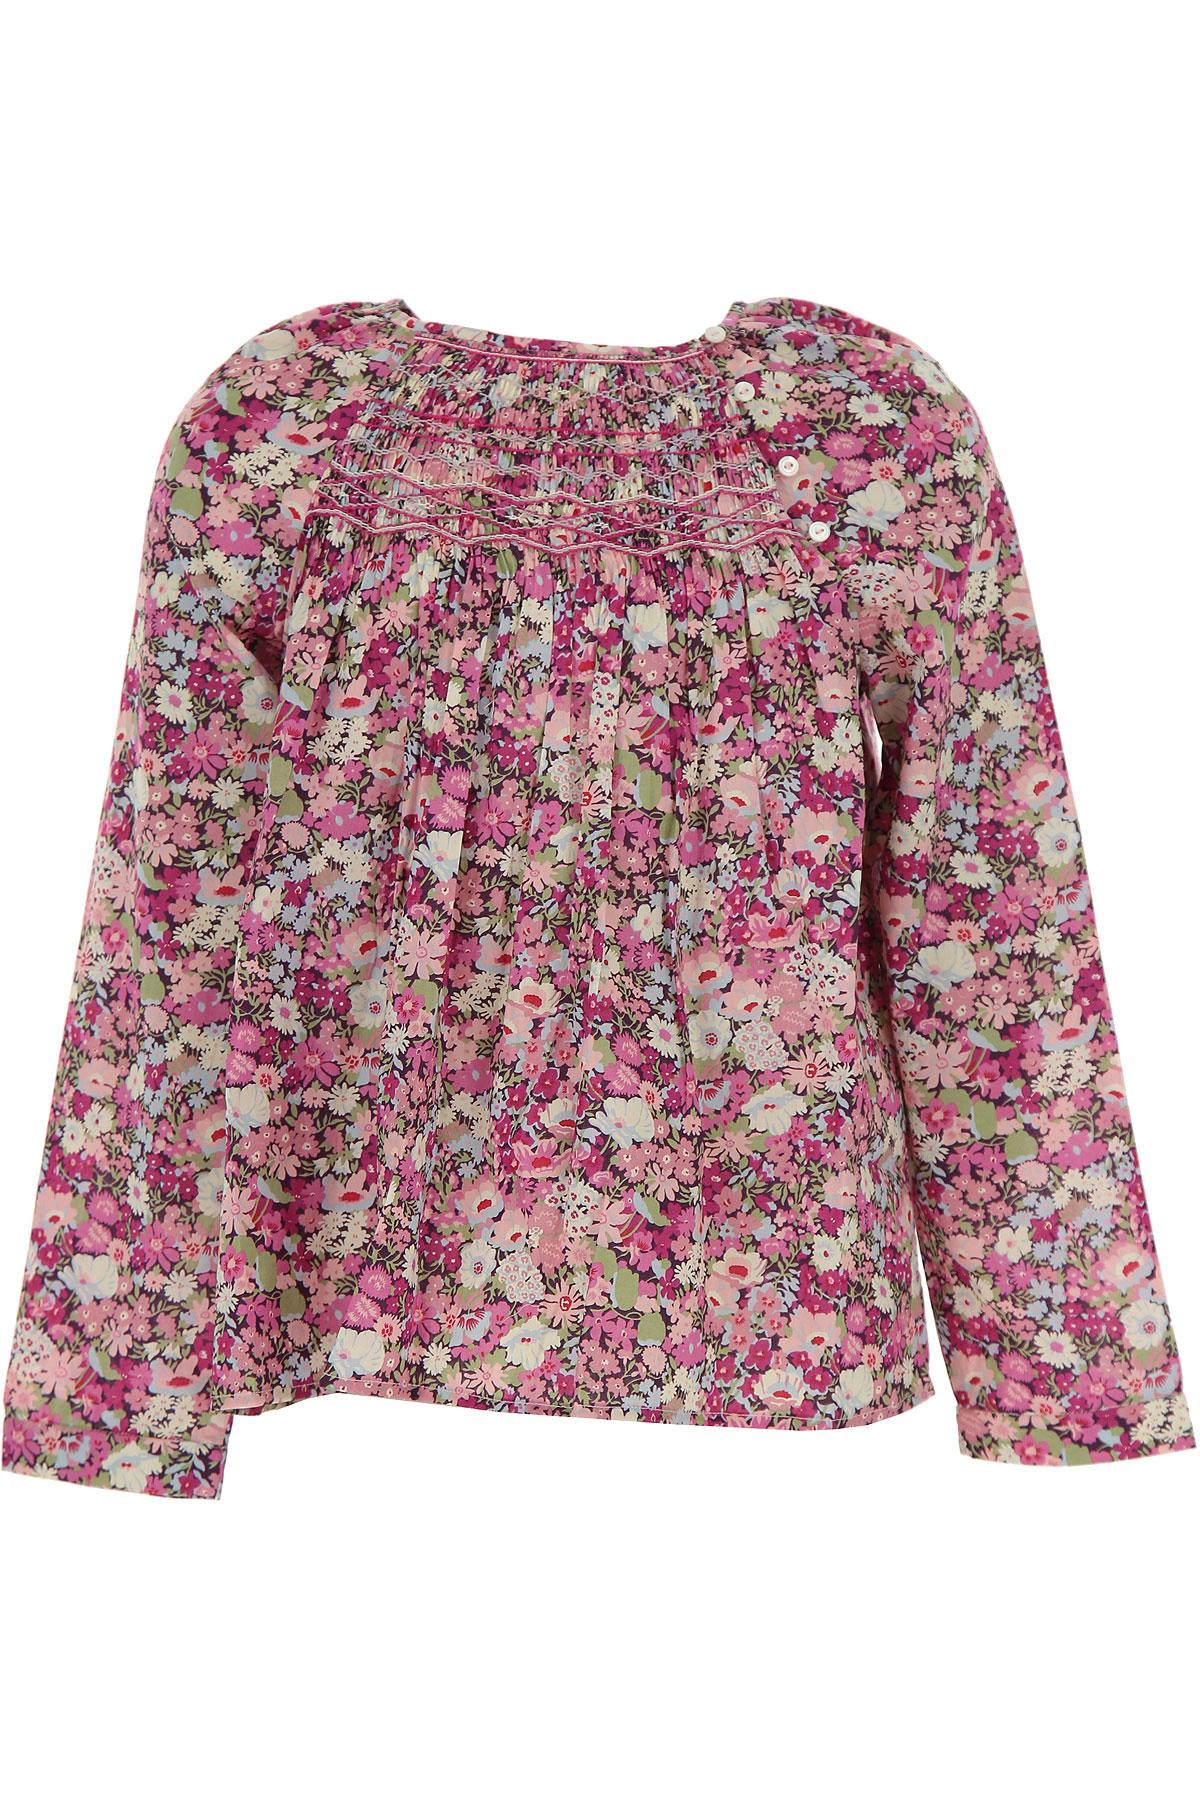 Bonpoint Kids Shirts for Girls On Sale, Lillac, Cotton, 2019, 10Y 12Y 6Y 8Y